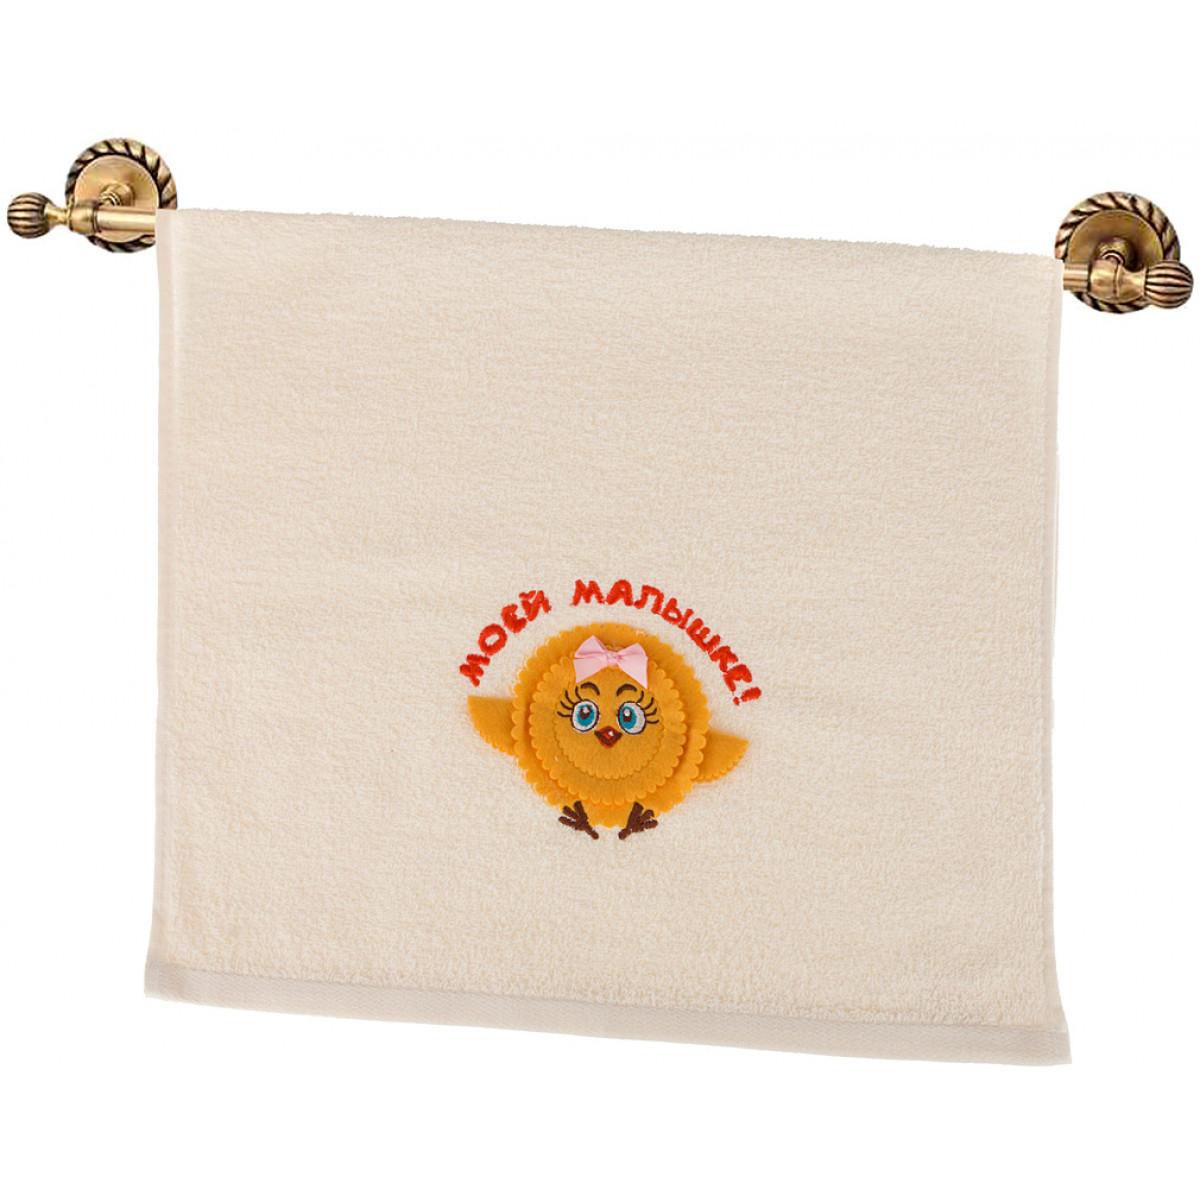 Полотенца Santalino Детское полотенце Kylie  (40х70 см) bravo полотенце детское пони 33 x 70 см 1089